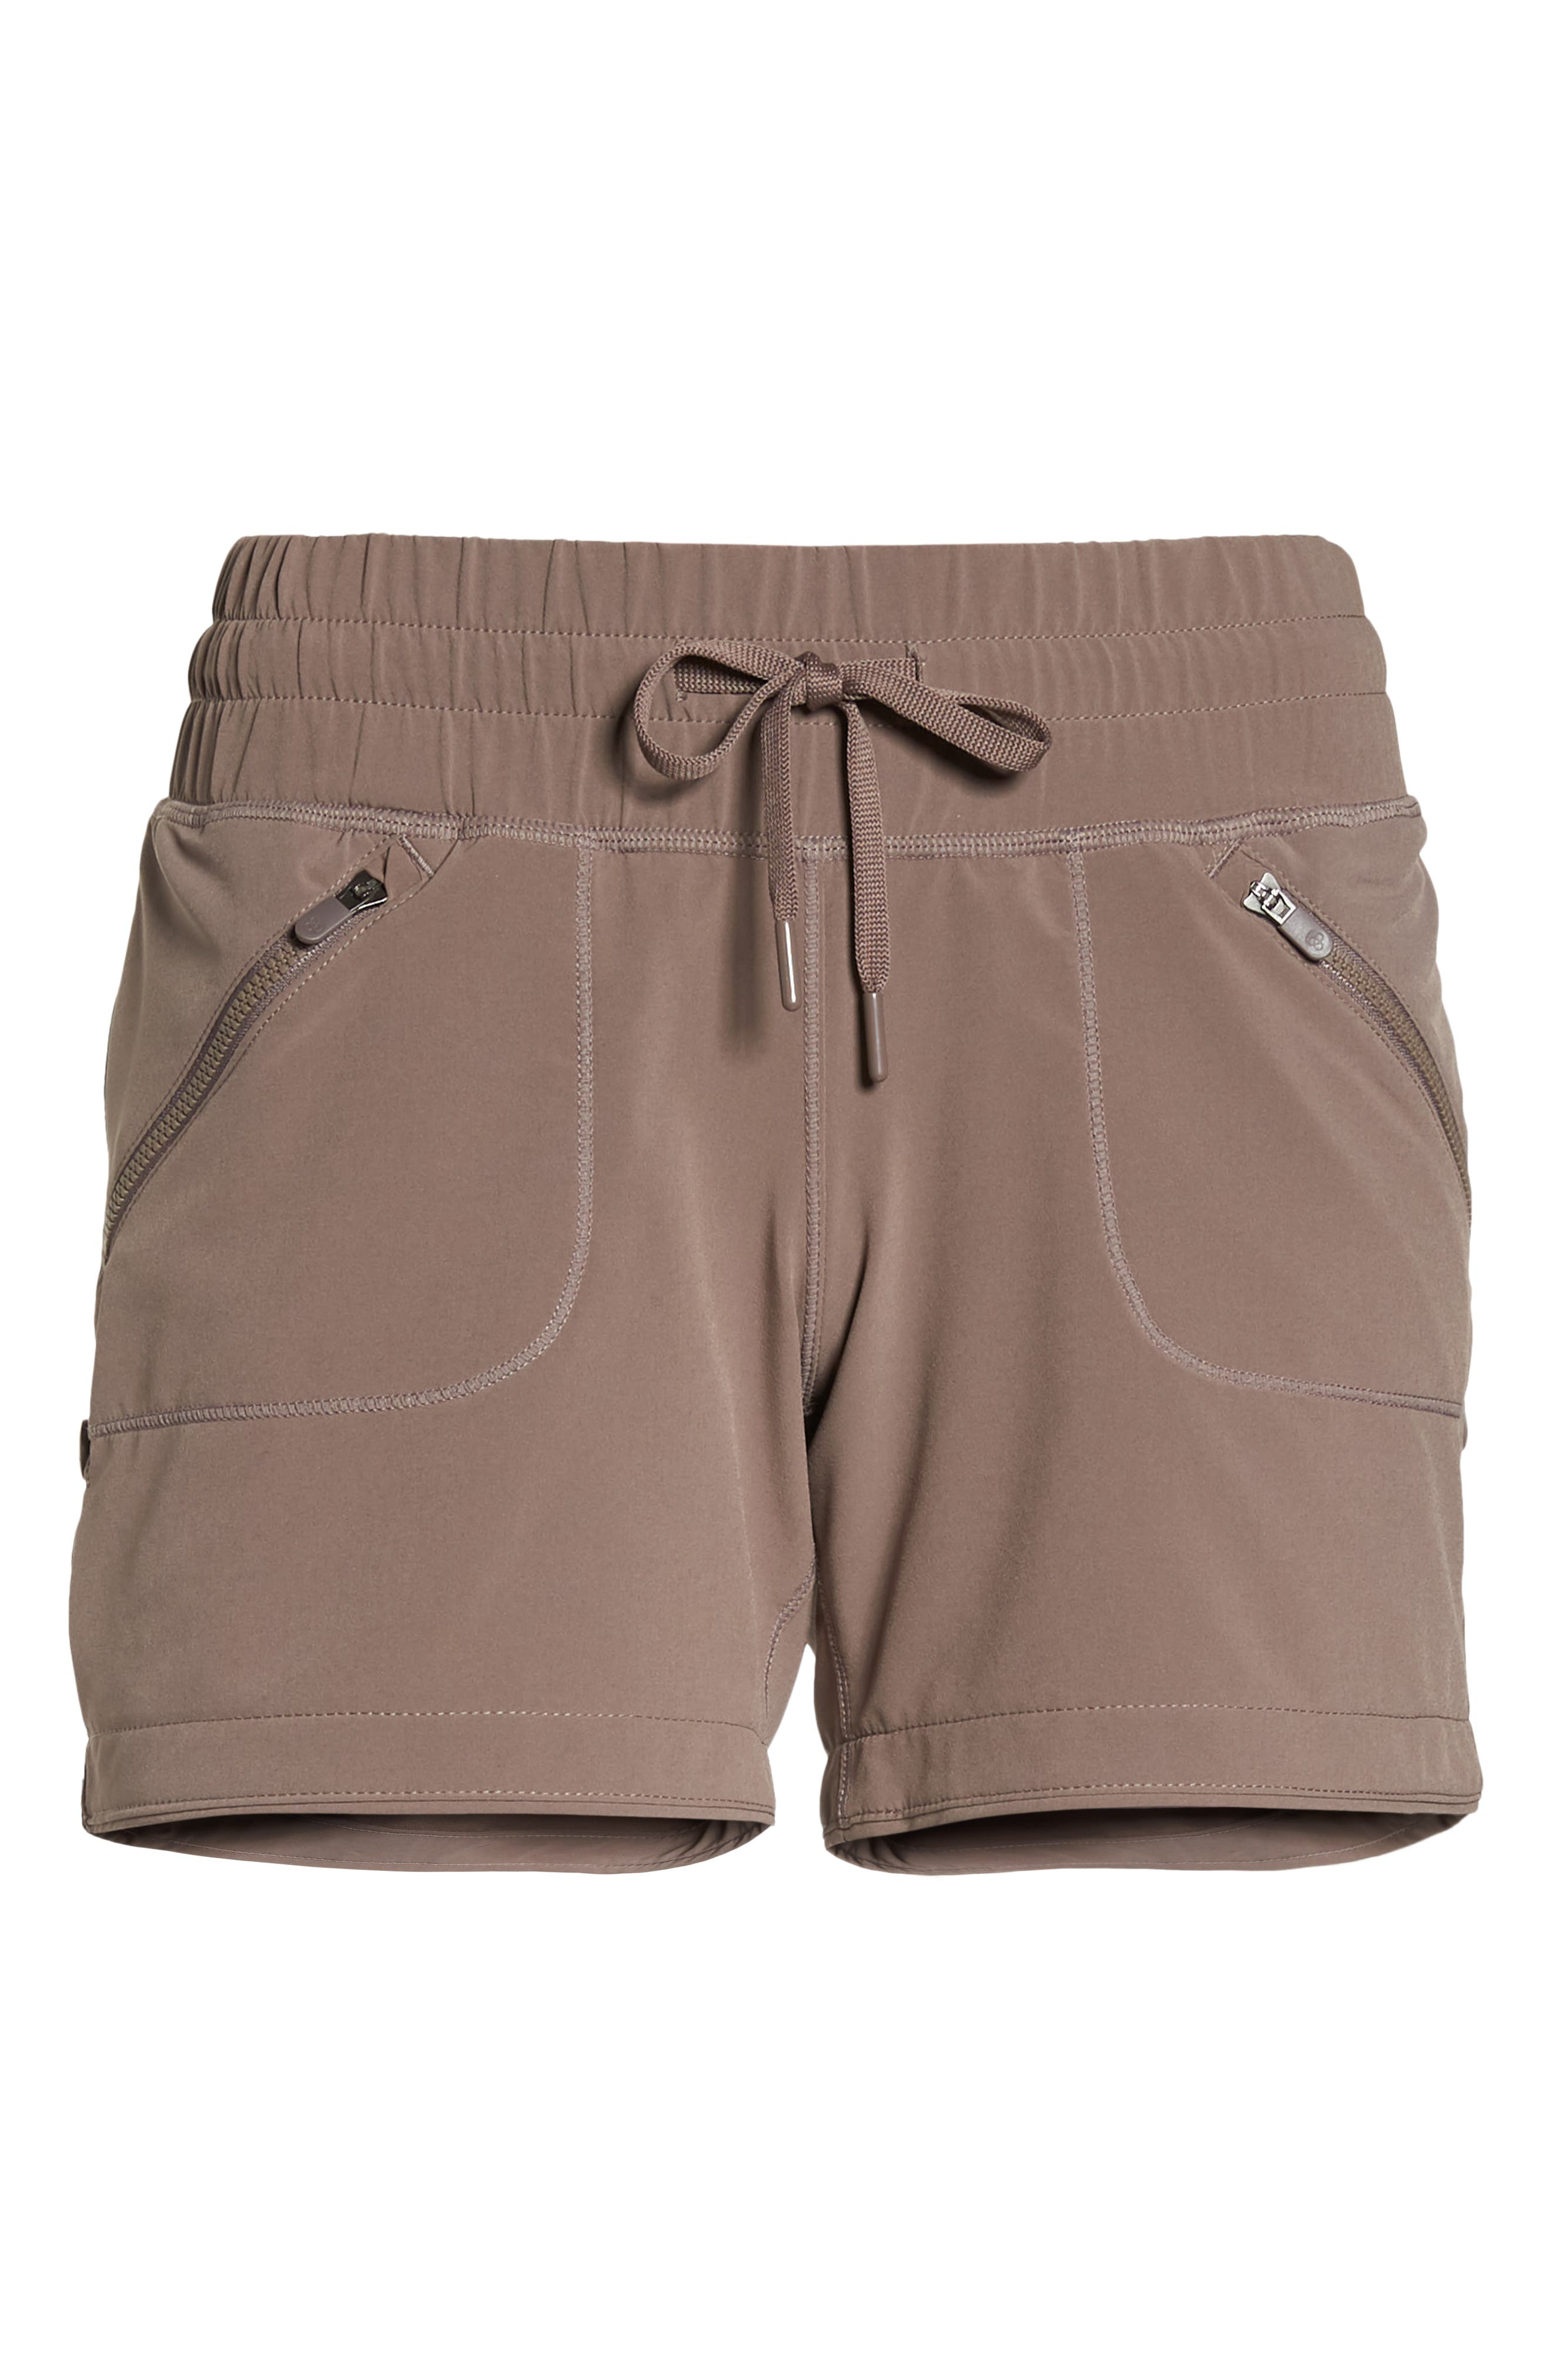 Switchback Shorts,                             Alternate thumbnail 48, color,